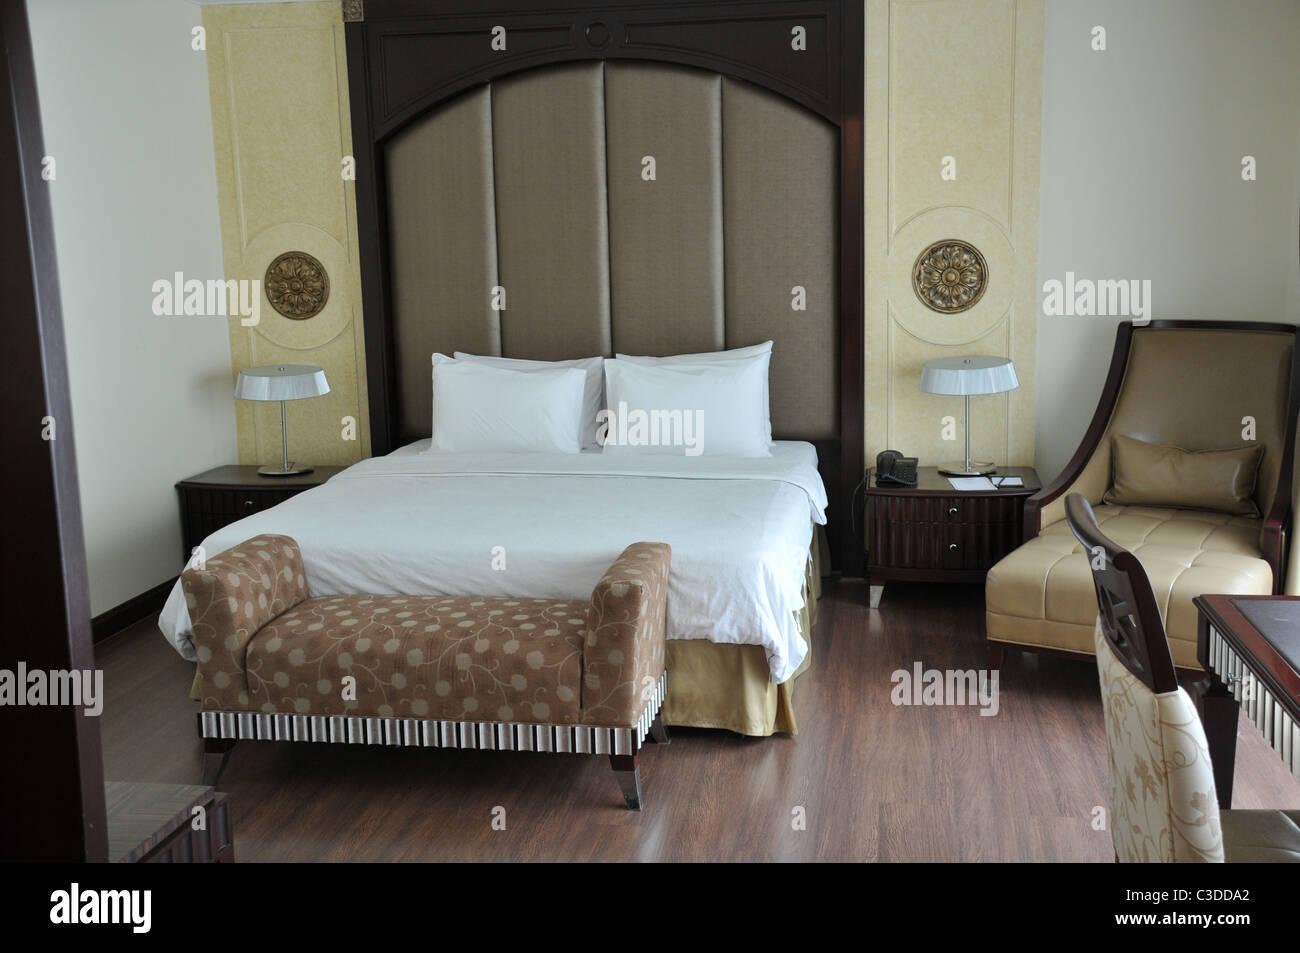 Pattaya Lk Renaissance Hotel Stock Photo 36560554 Alamy